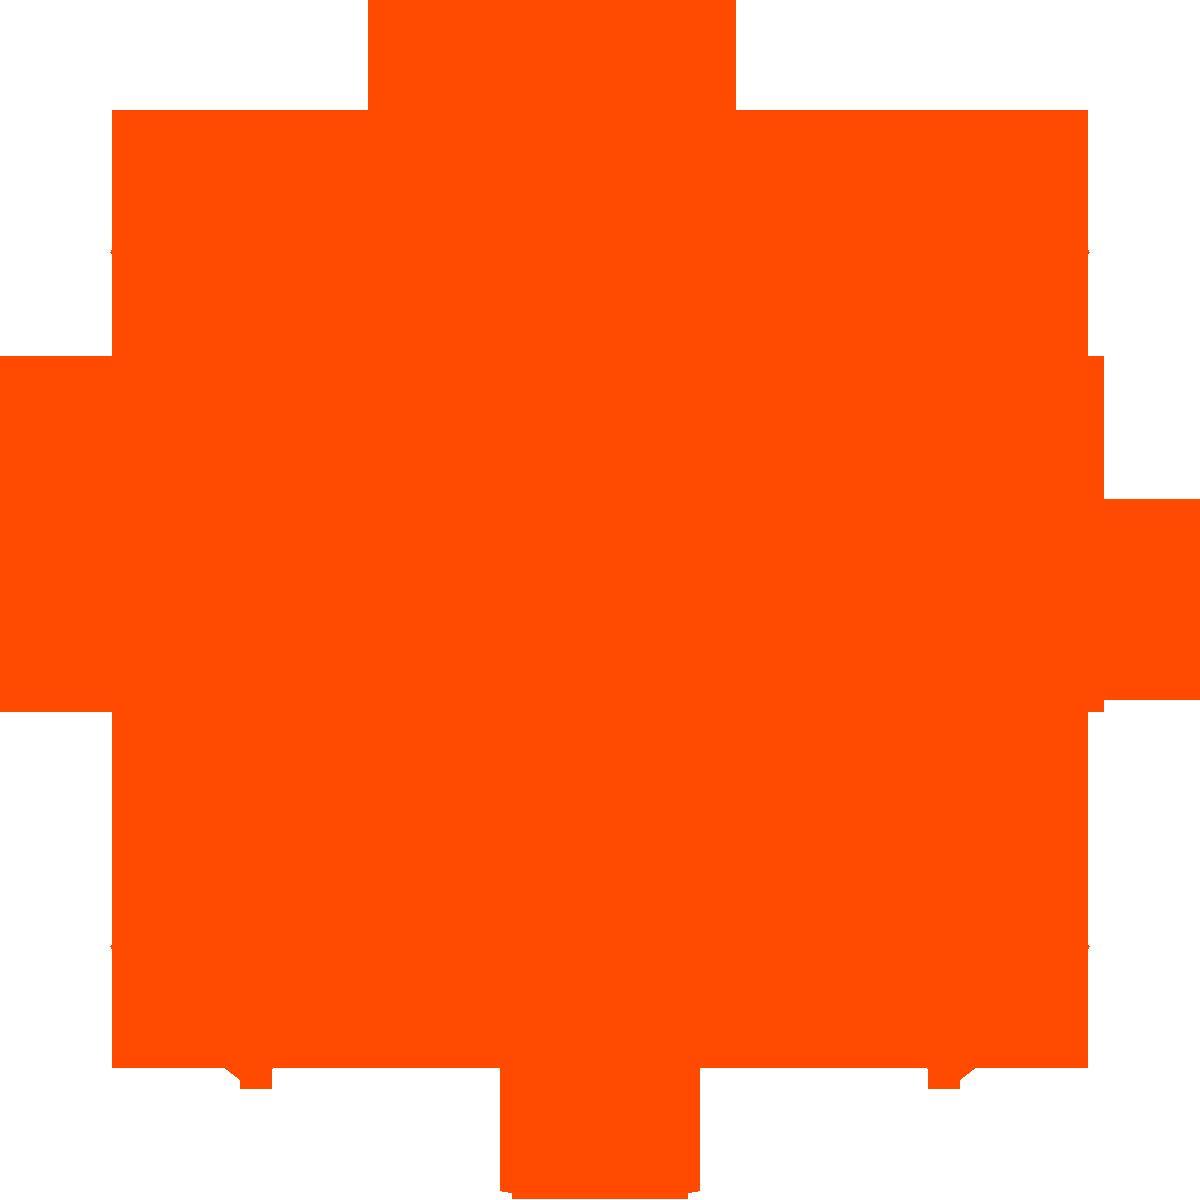 clipart free Zapier cli readme source. Vector contains platform